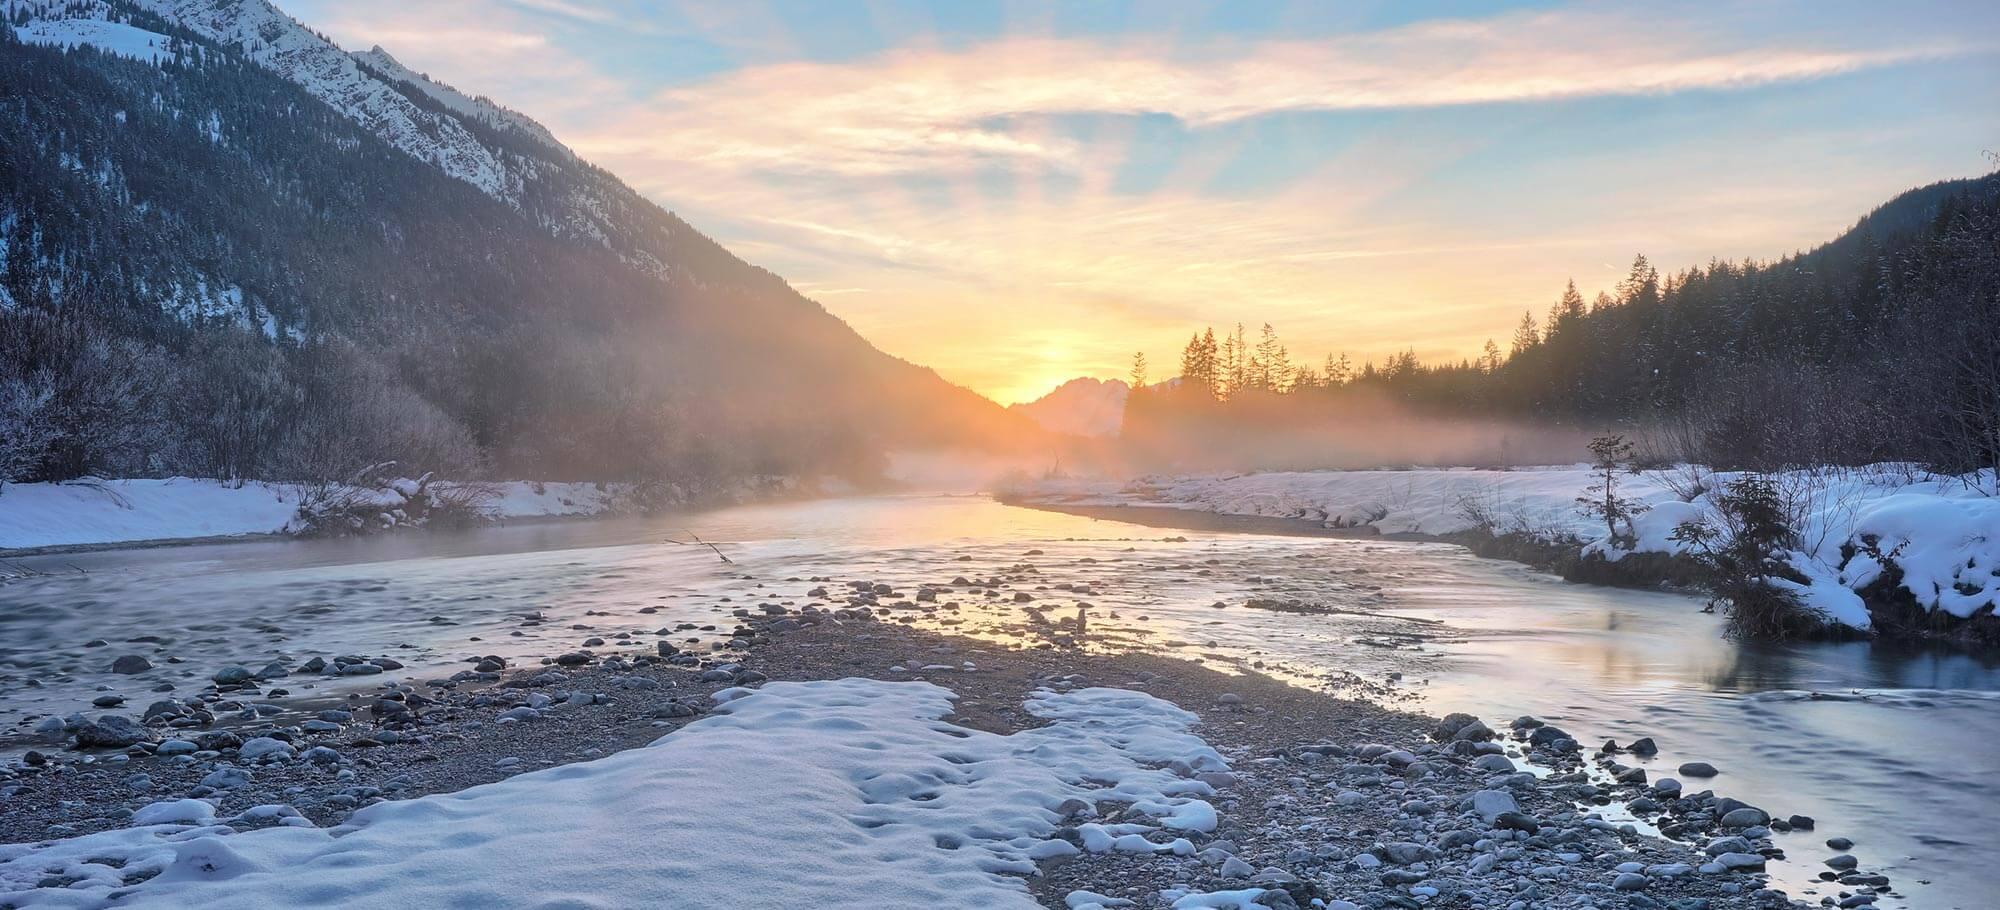 Sonnenuntergang an der Isar im Winter